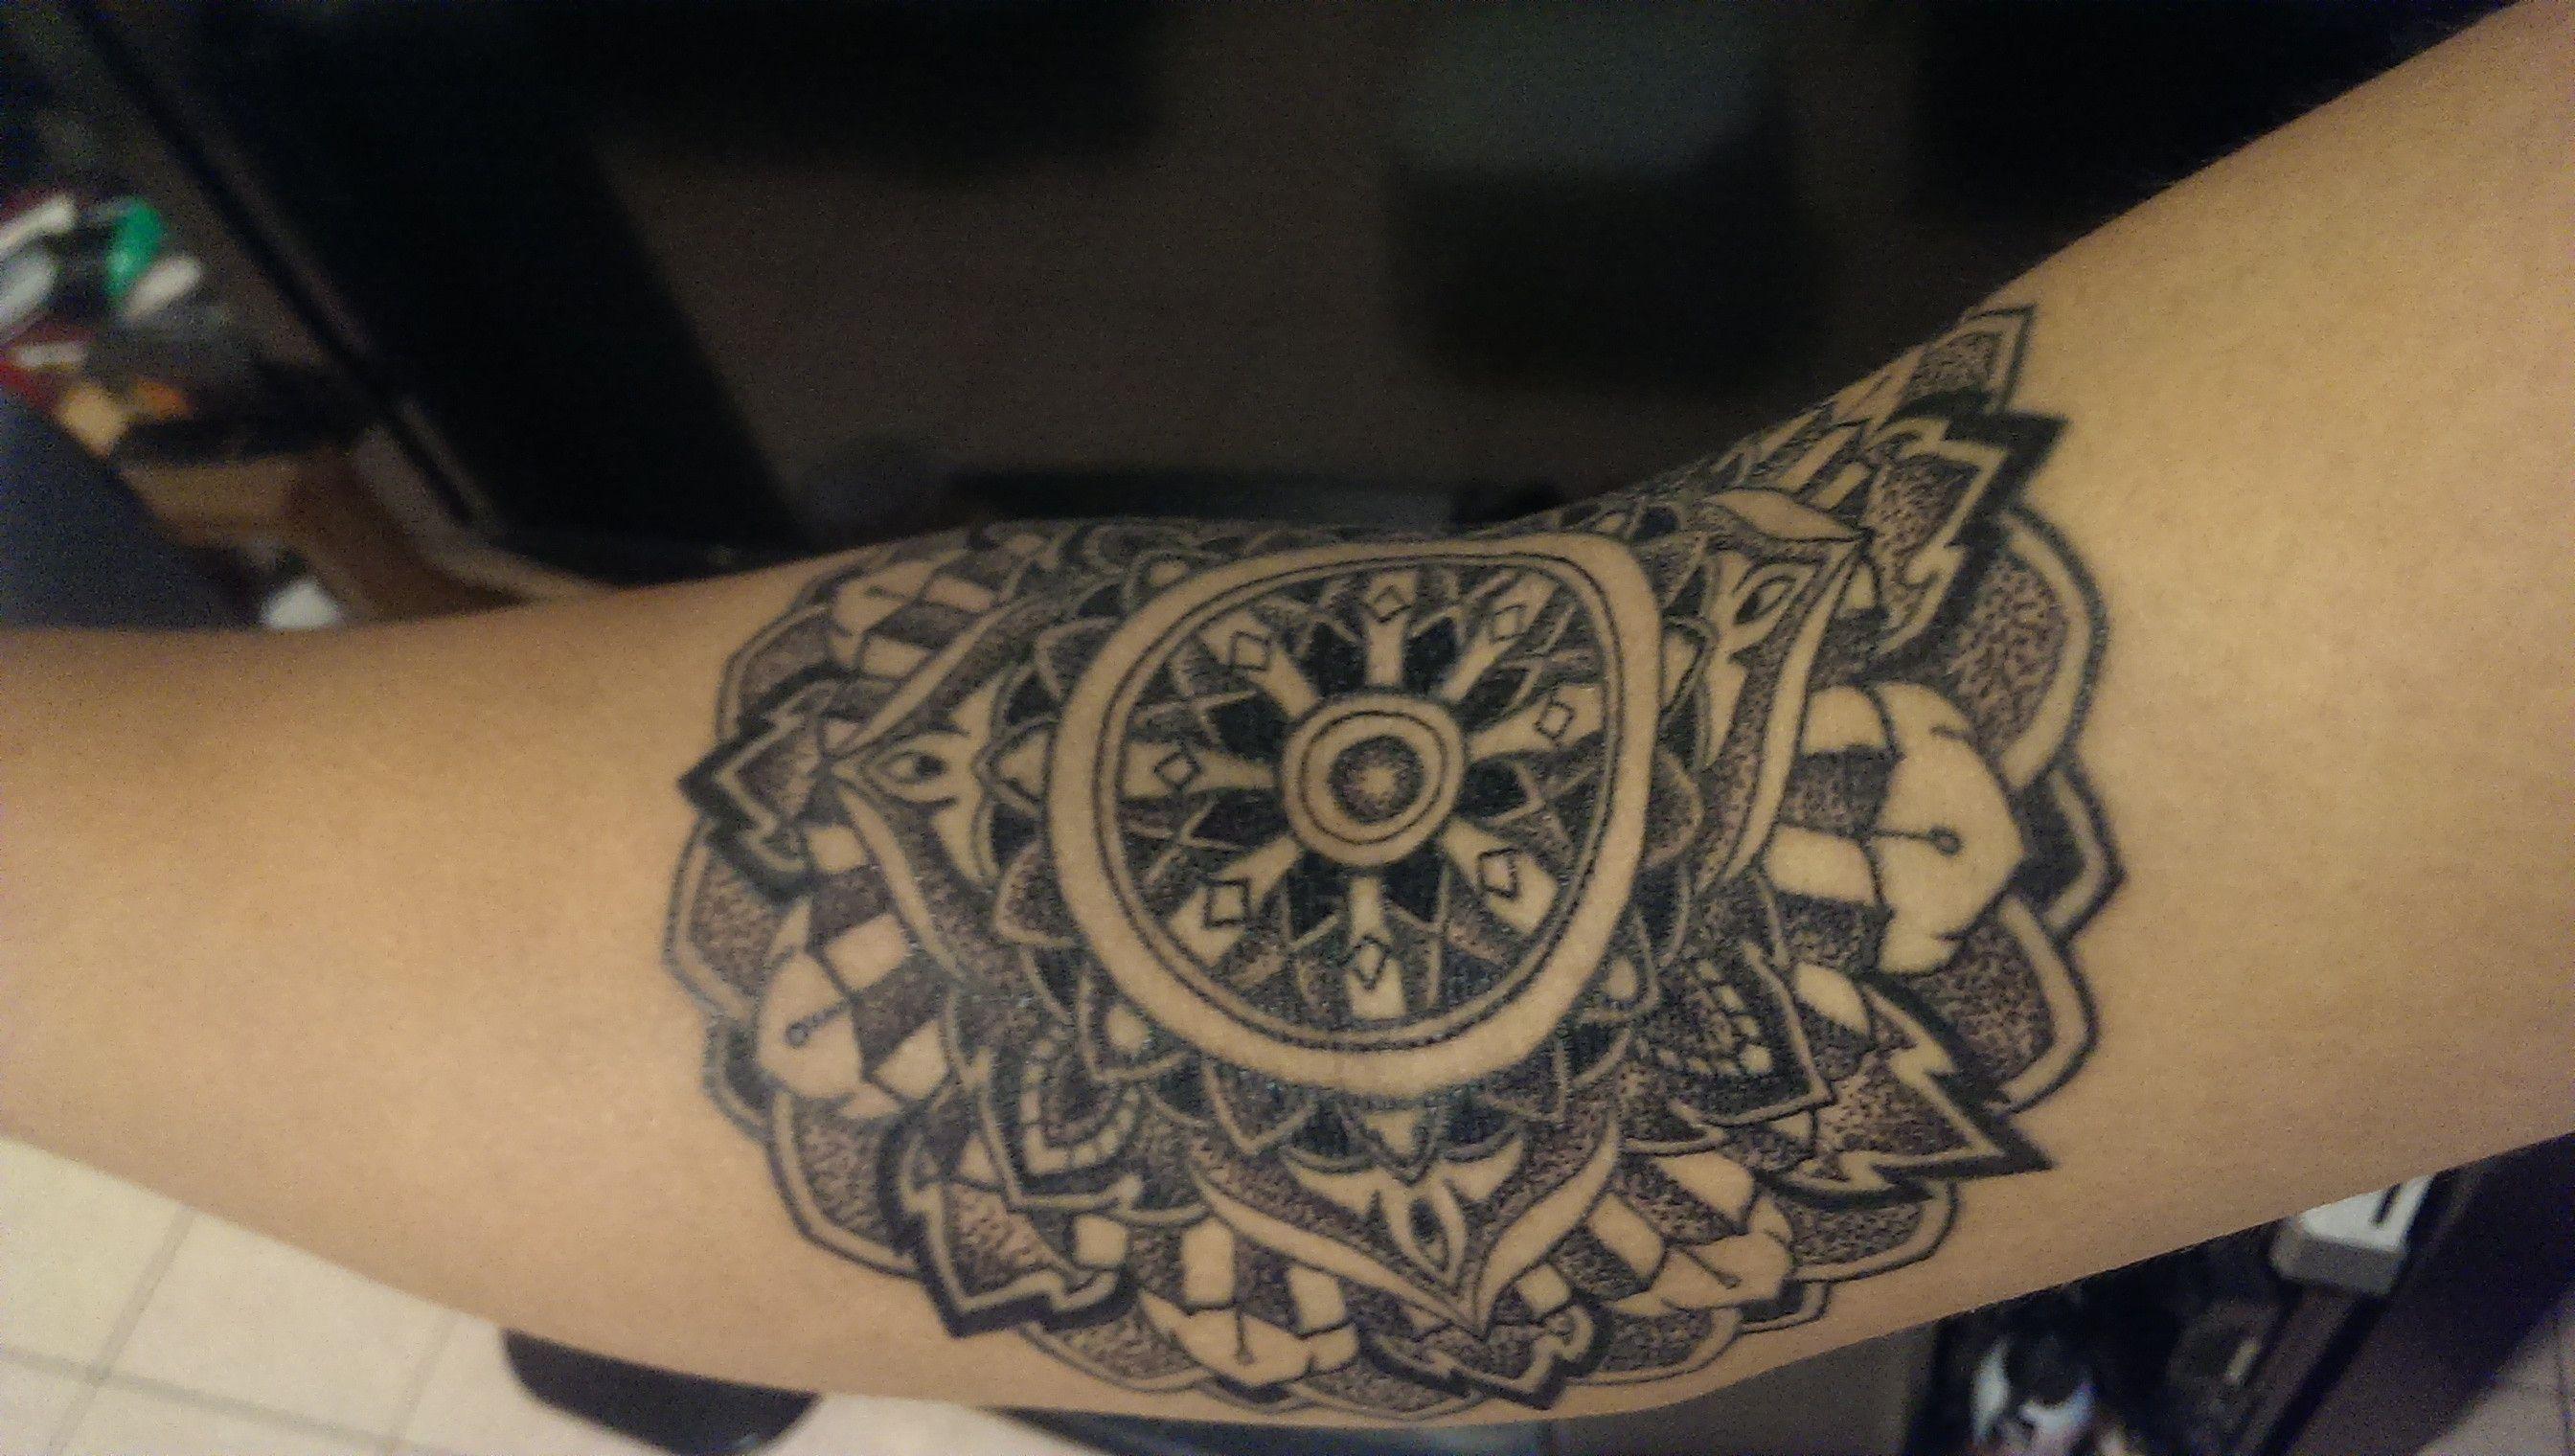 40 Dharma Wheel Tattoo Designs For Men – Dharmachakra Ink Ideas 40 Dharma Wheel Tattoo Designs For Men – Dharmachakra Ink Ideas new picture